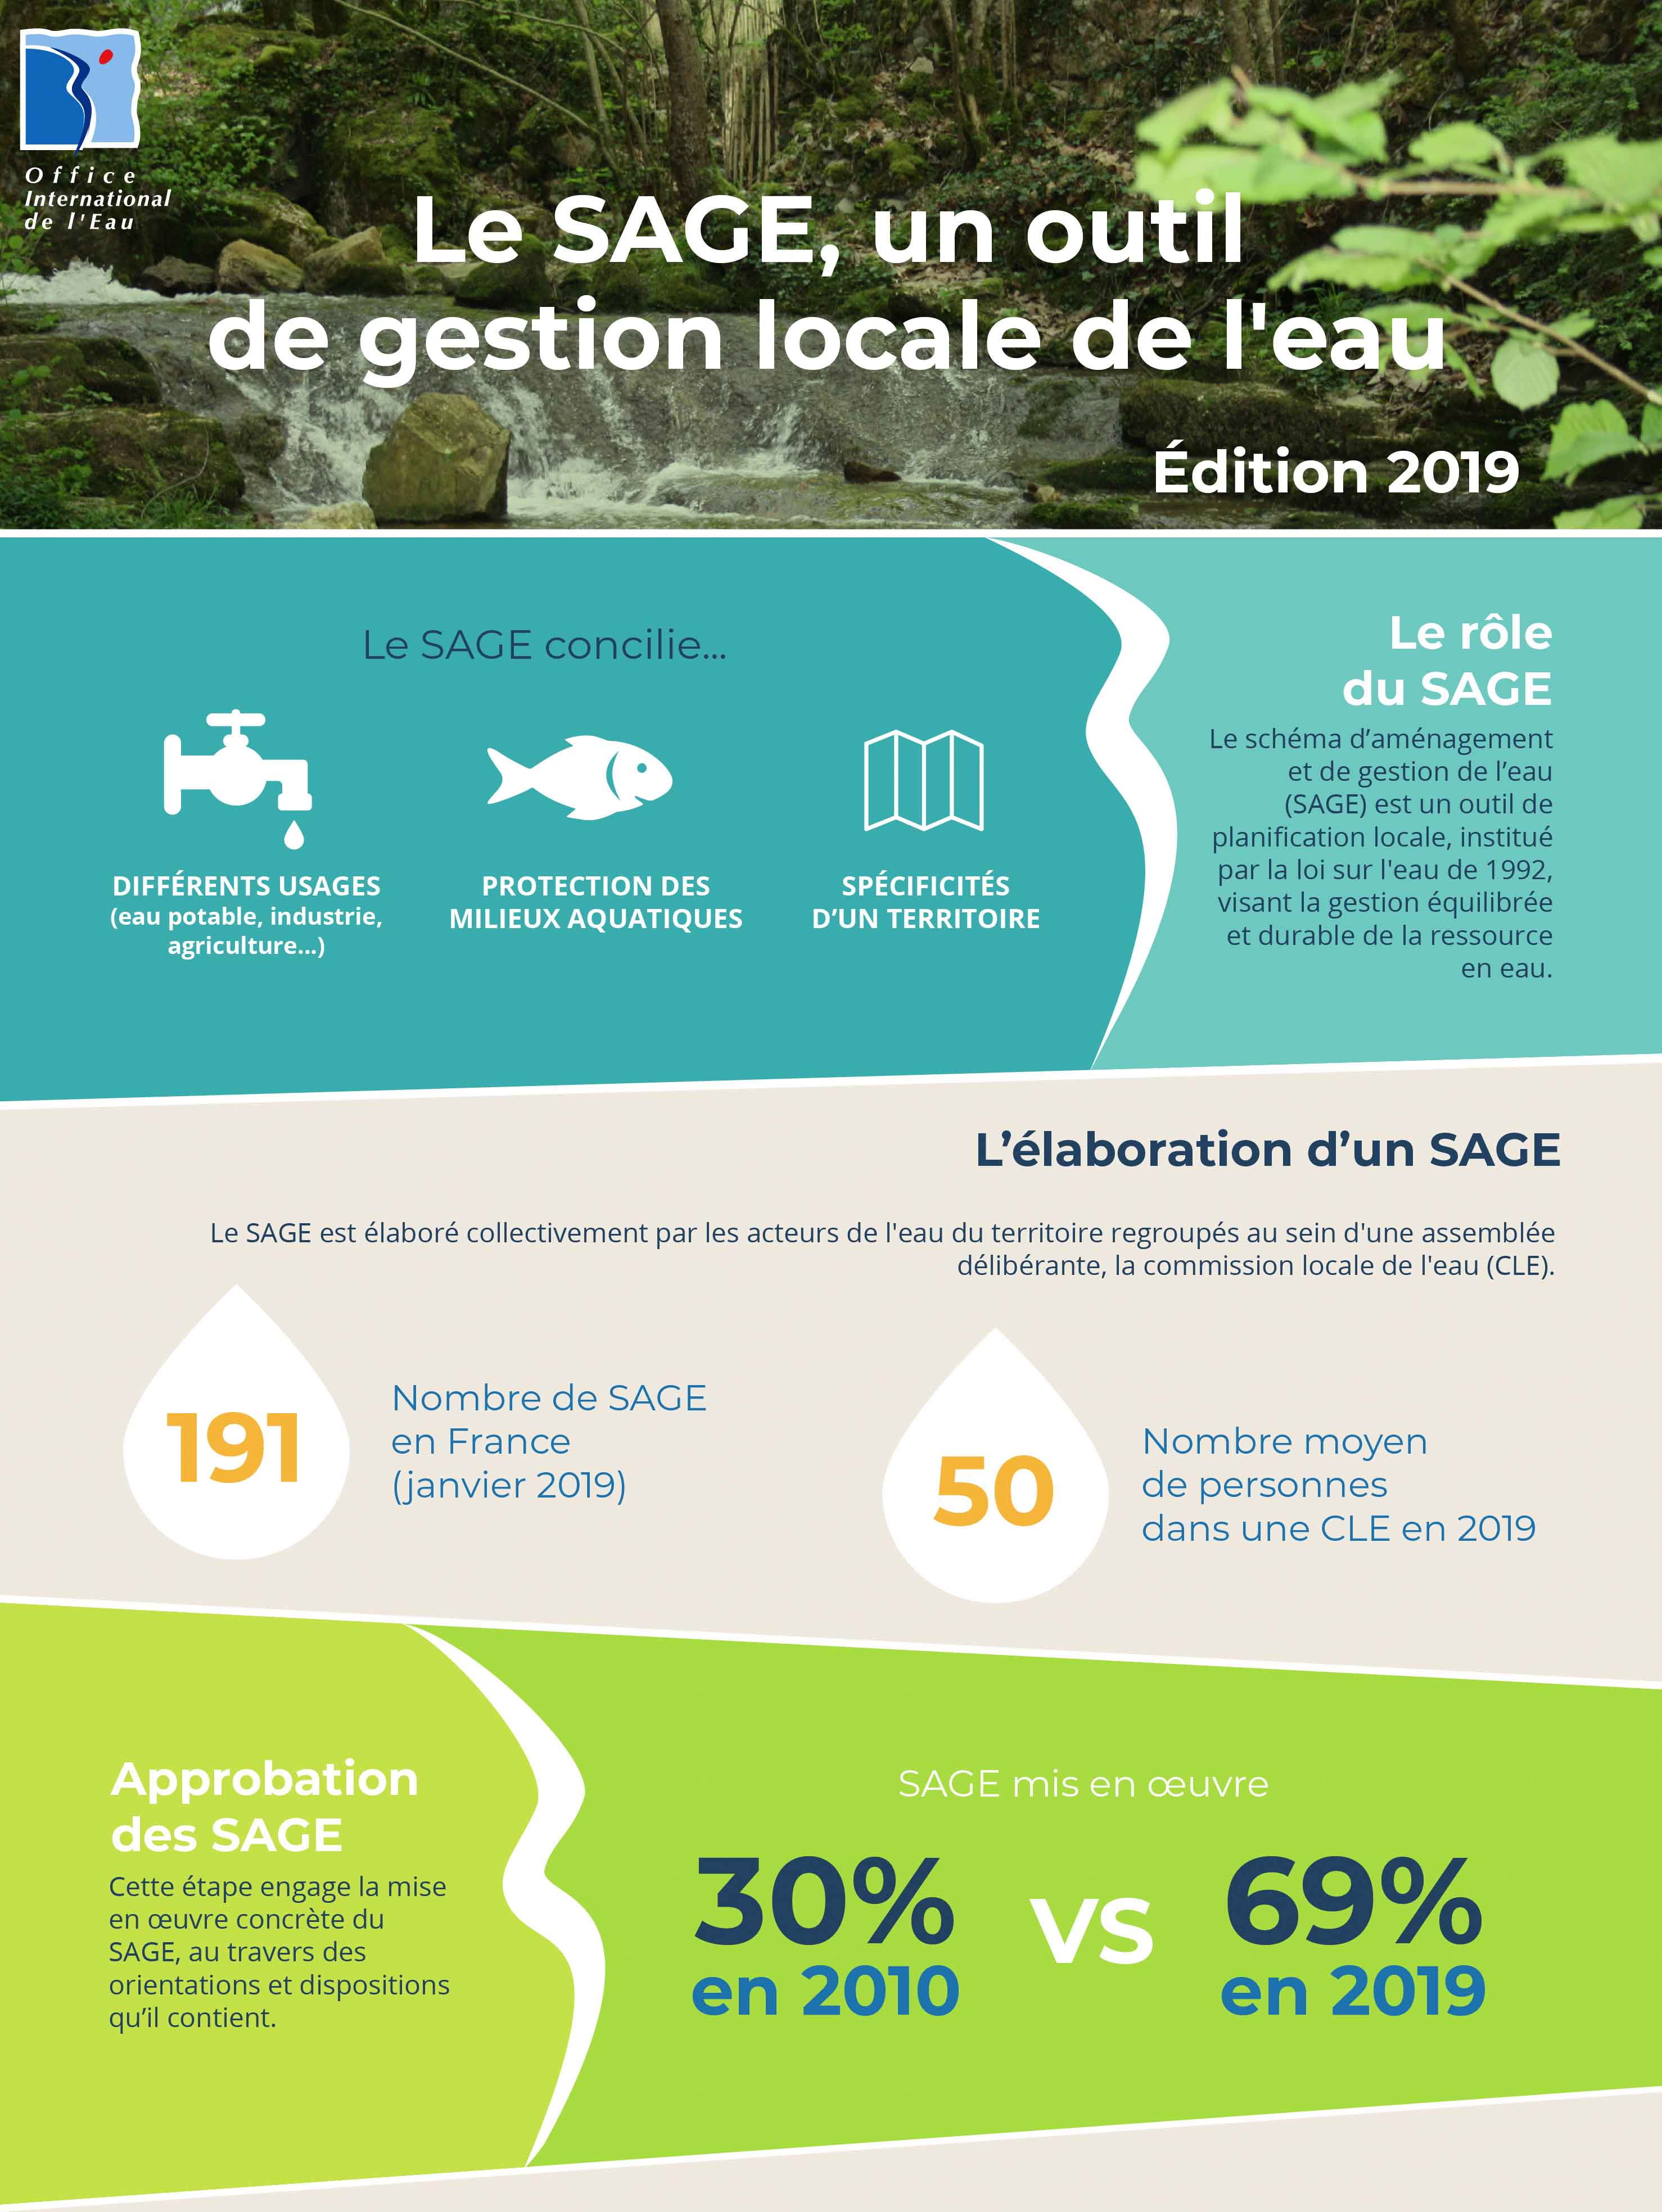 Infographie SAGE 2019 - © OIEau